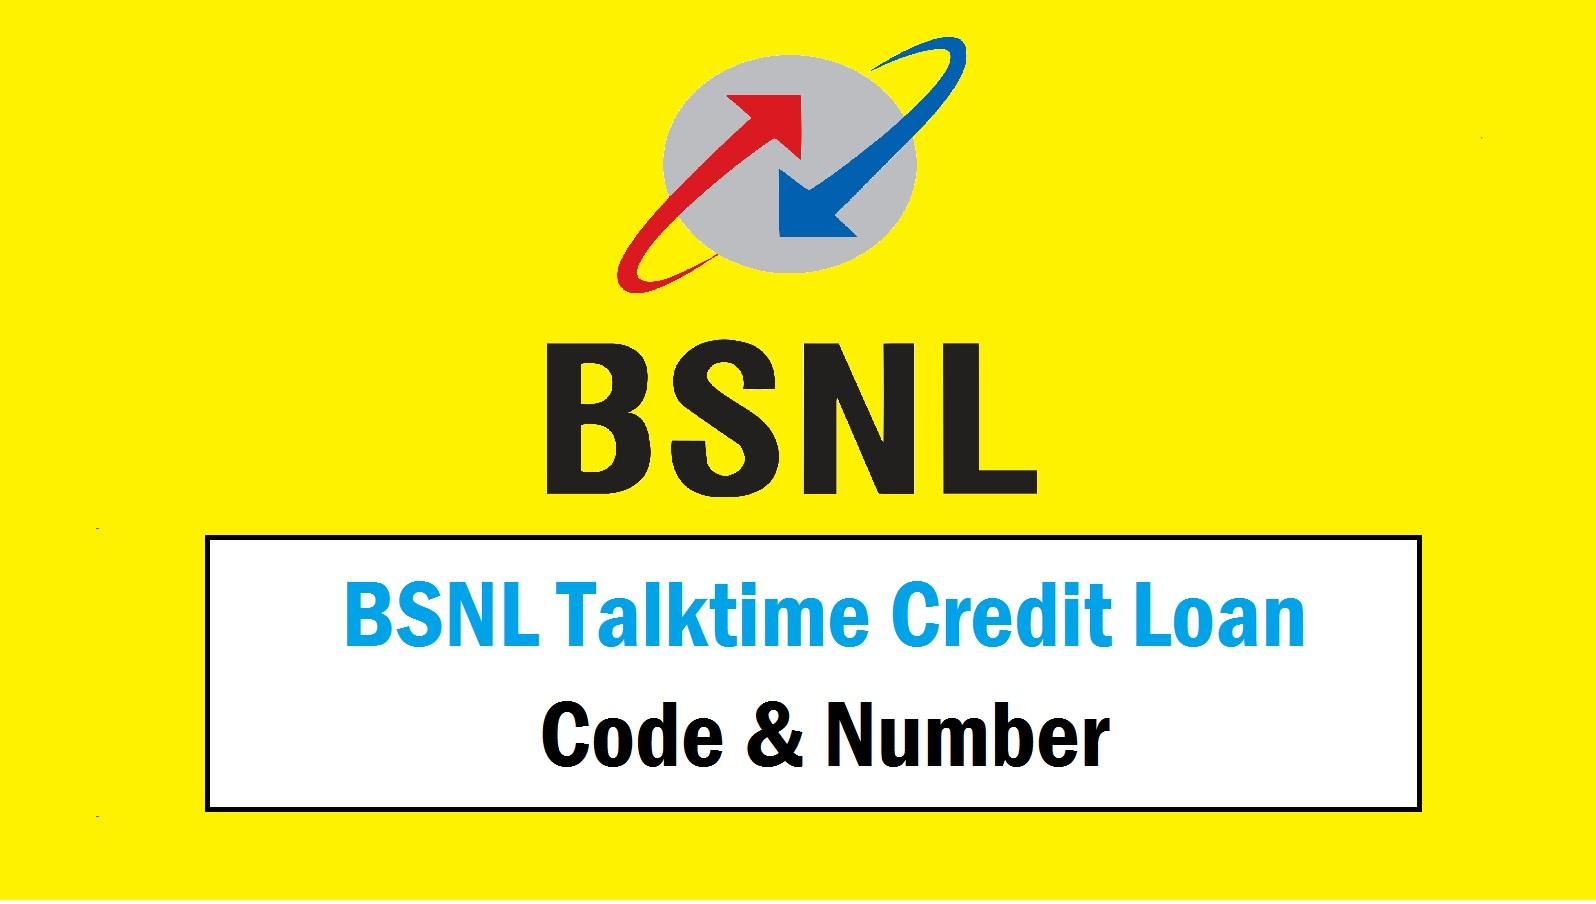 BSNL Talktime Credit Loan